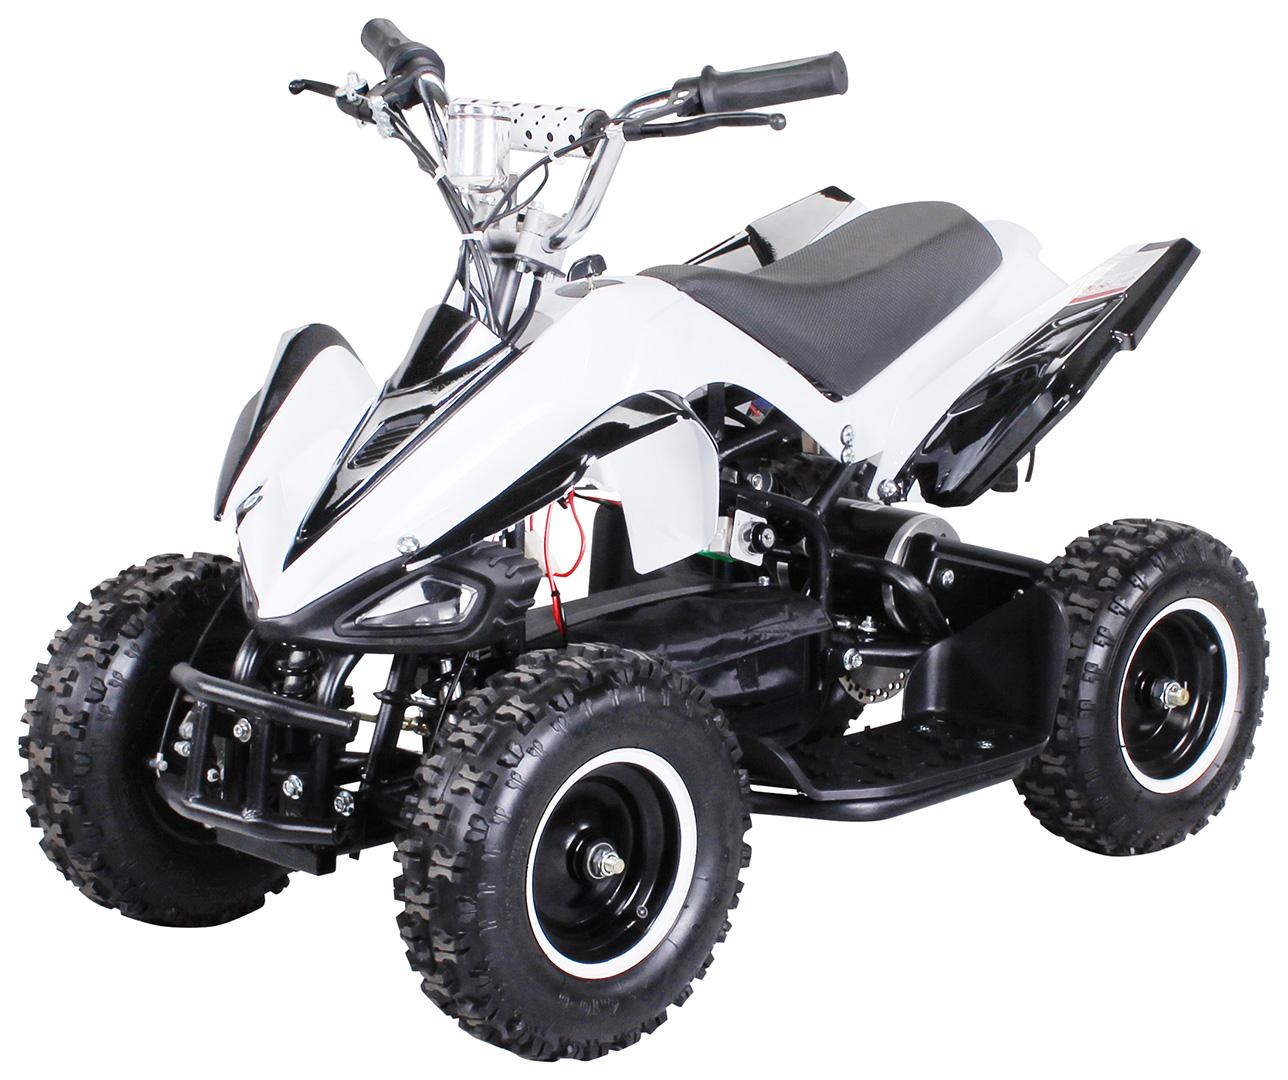 mini elektro kinder racer 800 watt atv pocket quad elektro kinder quads kinder fahrzeuge. Black Bedroom Furniture Sets. Home Design Ideas